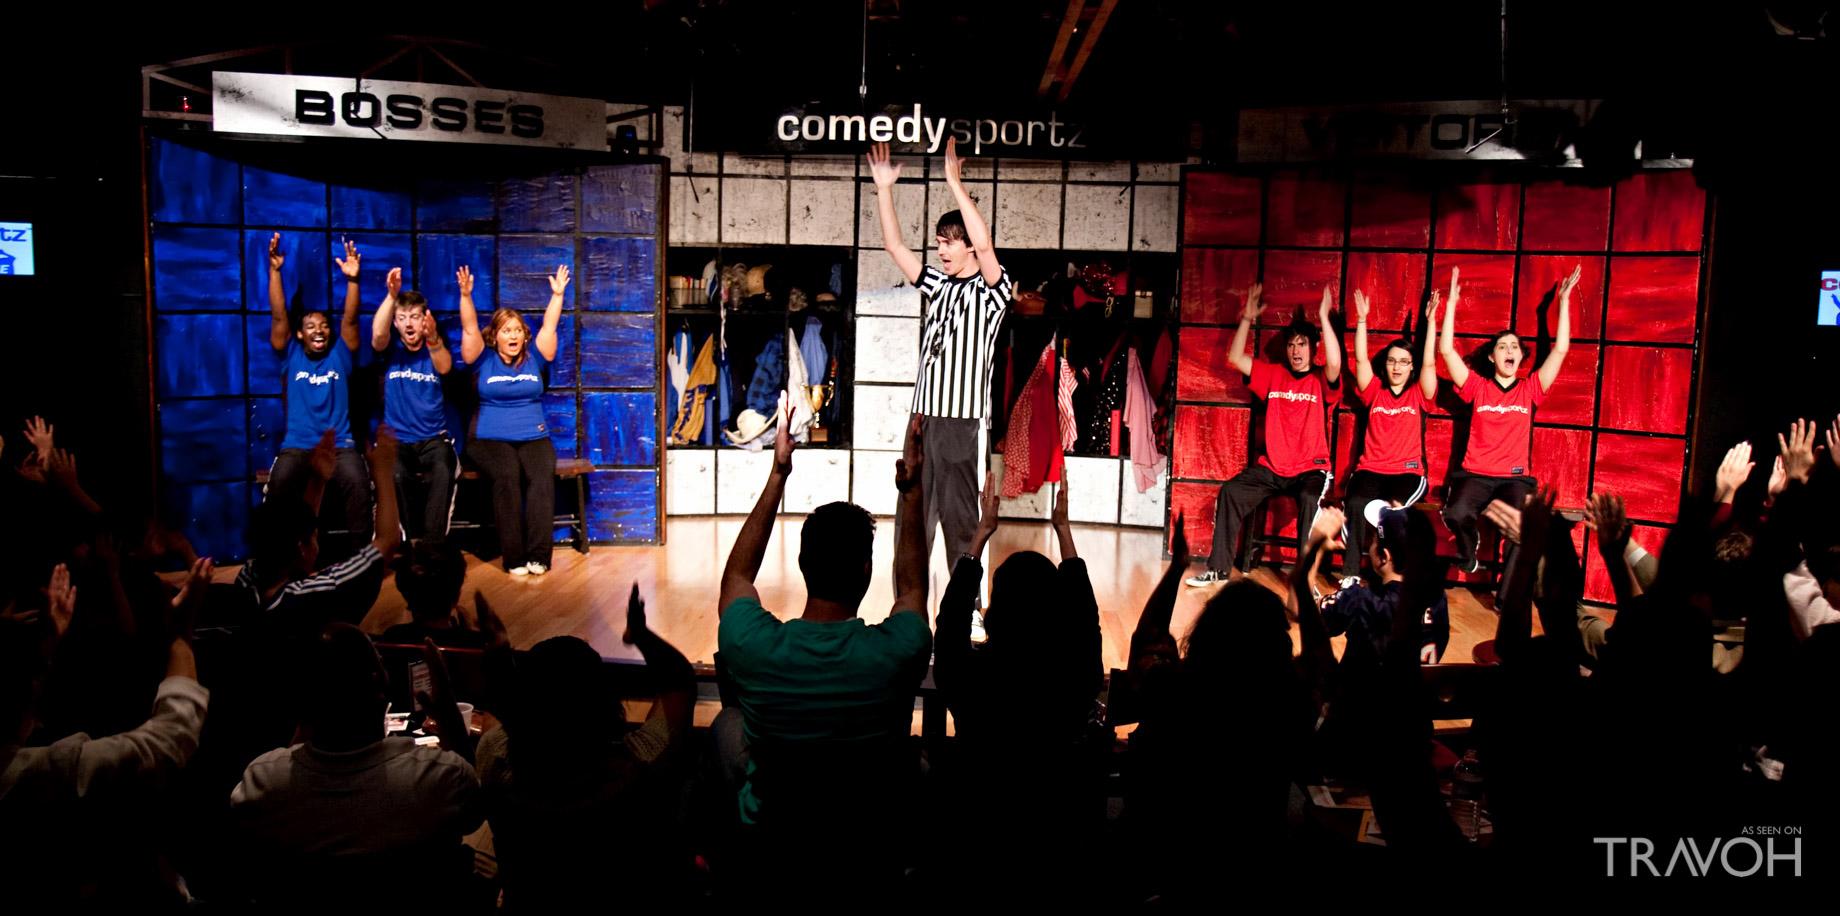 ComedySportz - CSz Theater Chicago 929 W. Belmont Ave. Chicago, IL 60657